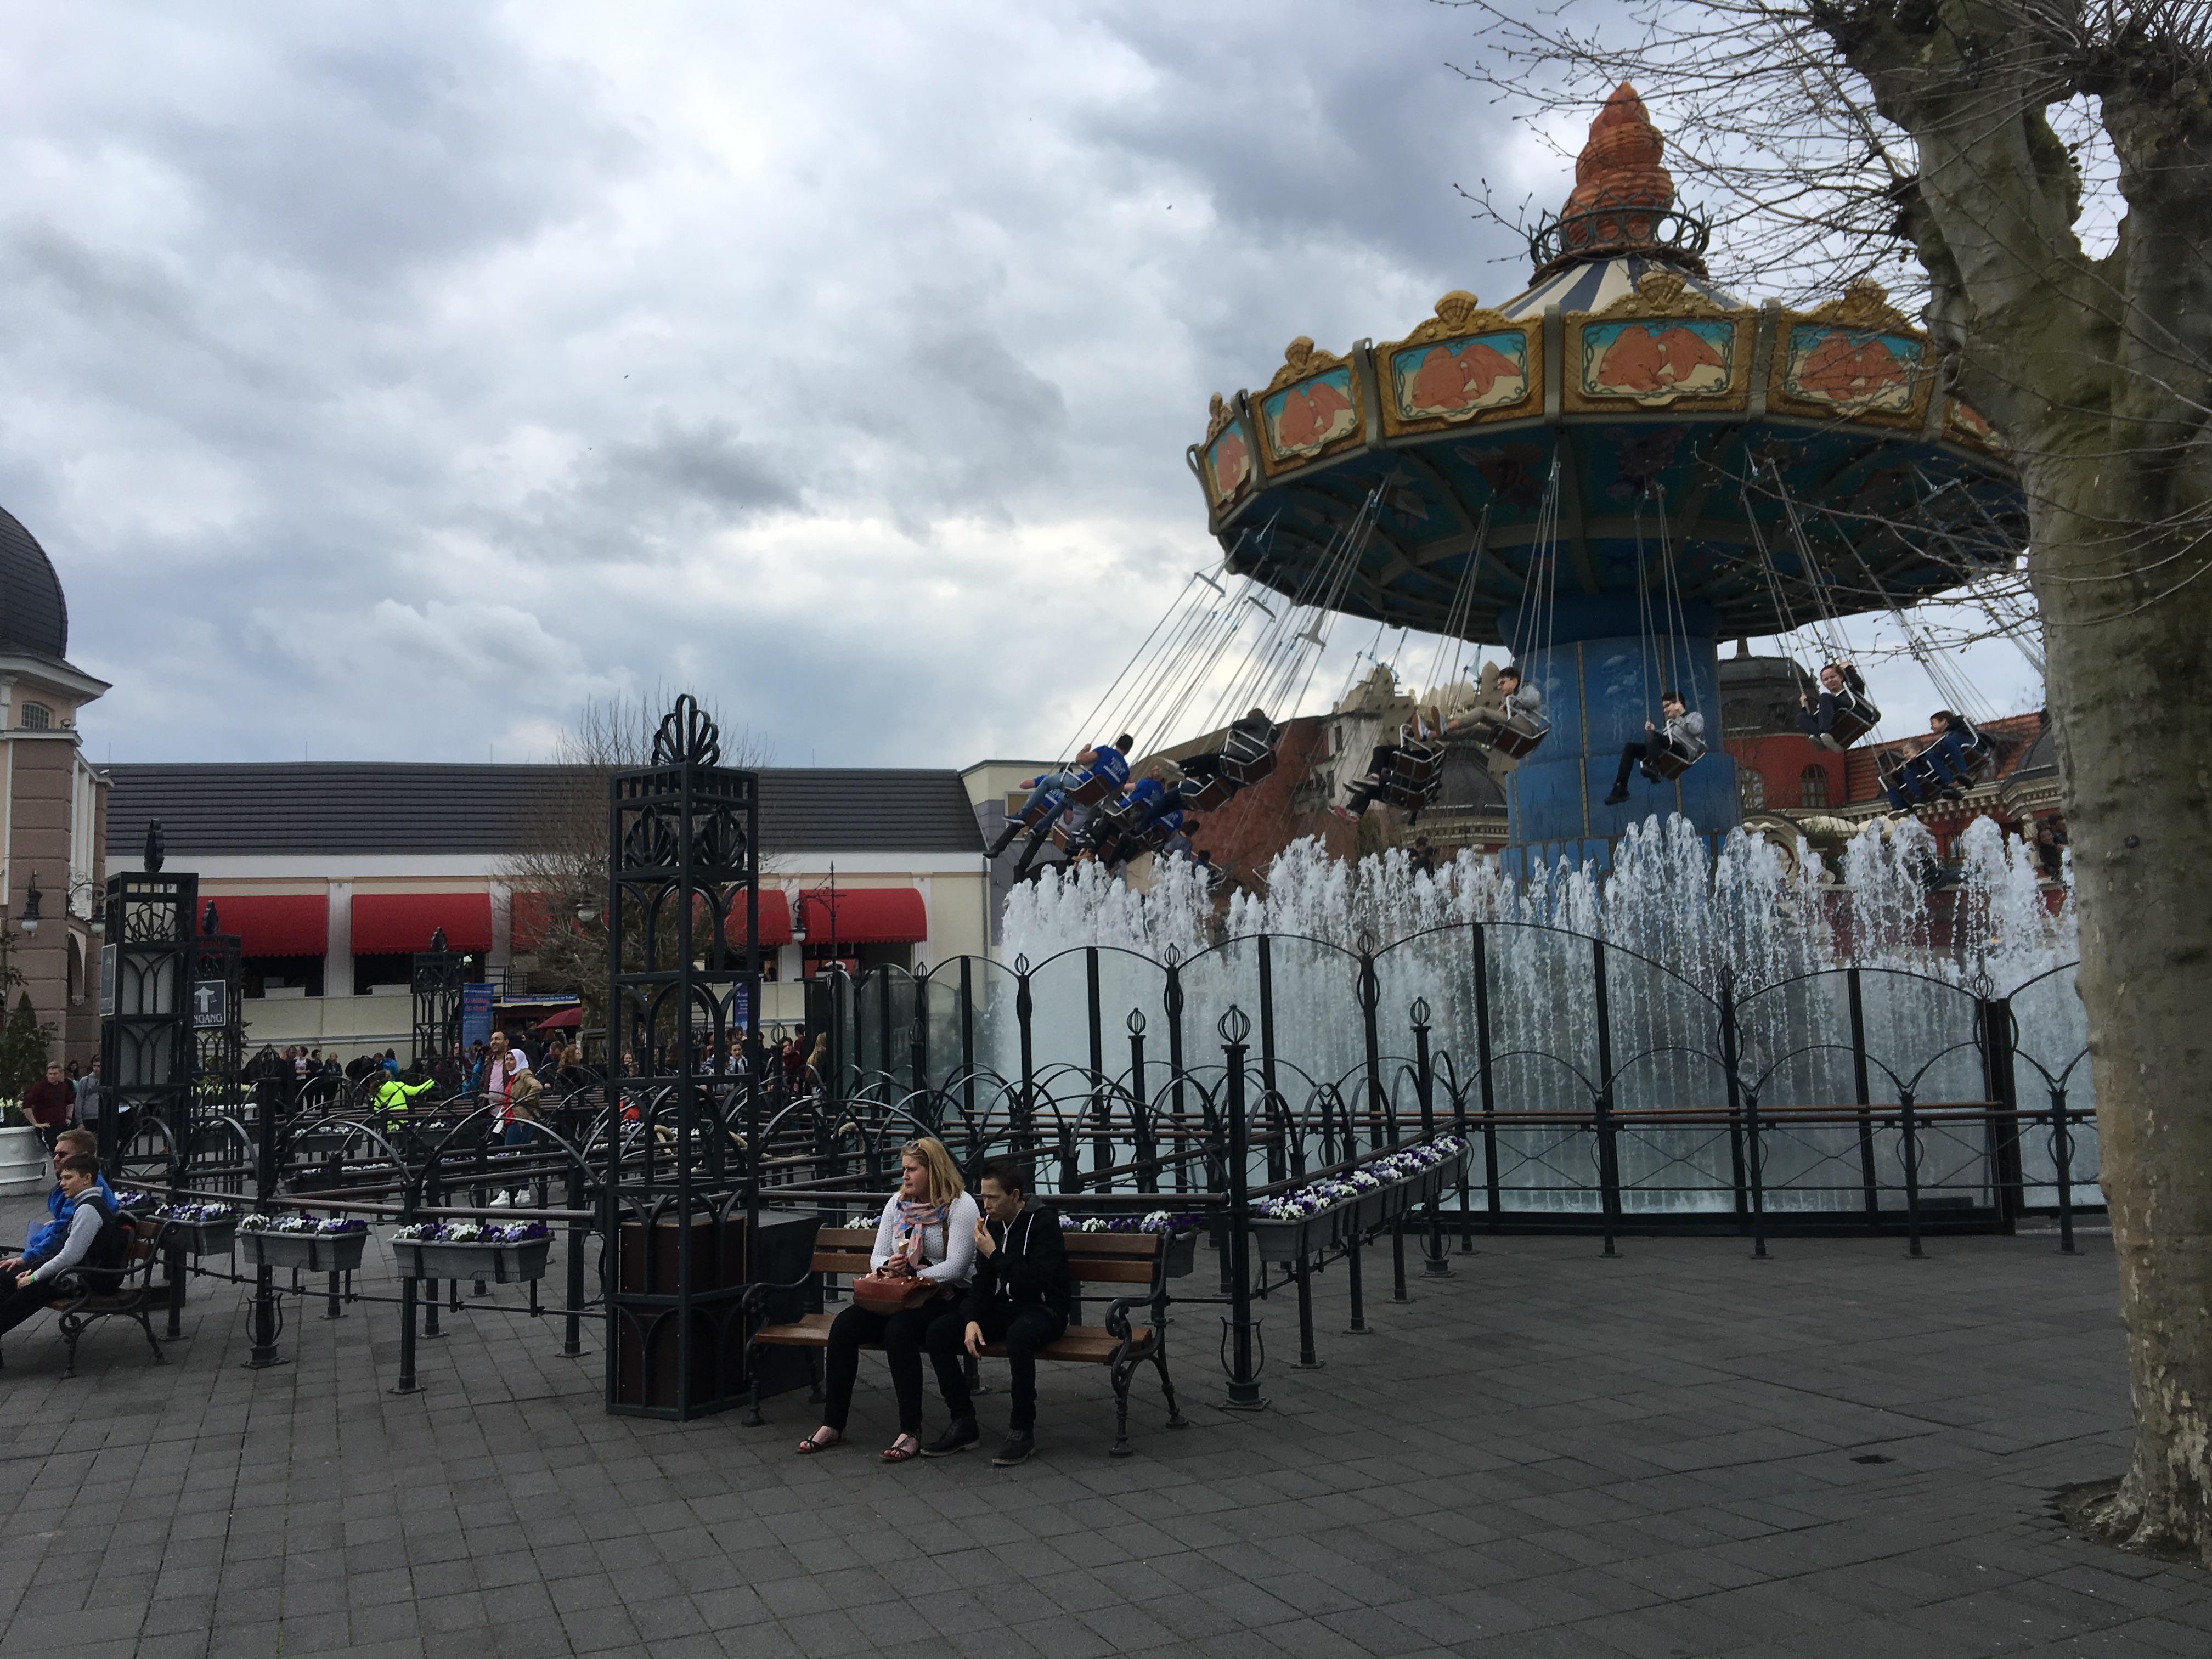 http://www.park-check.de/wp-content/uploads/2017/04/IMG_6019.jpg